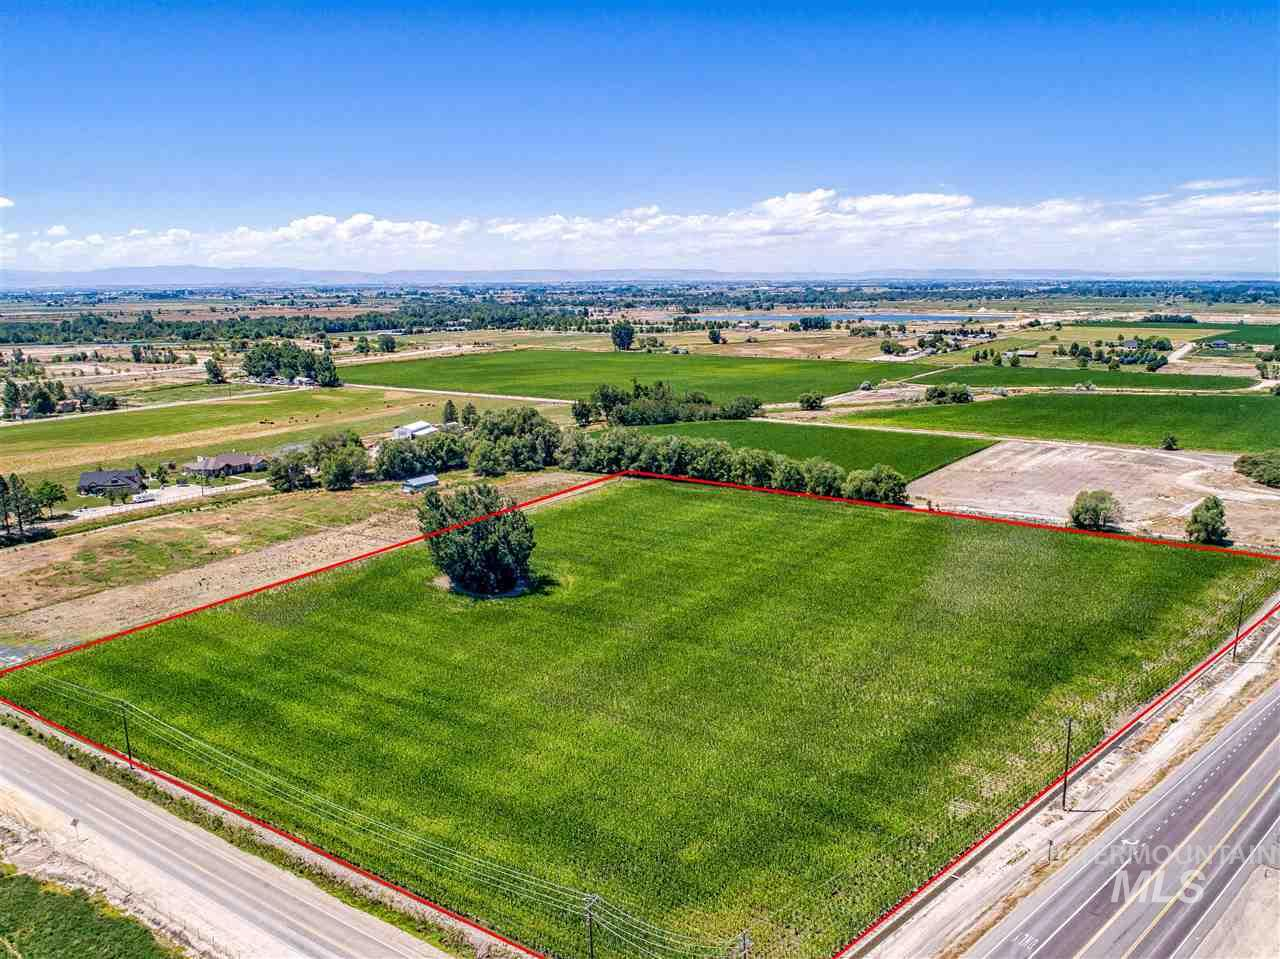 TBD 10.2 acres Highway 44, Star, ID 83669